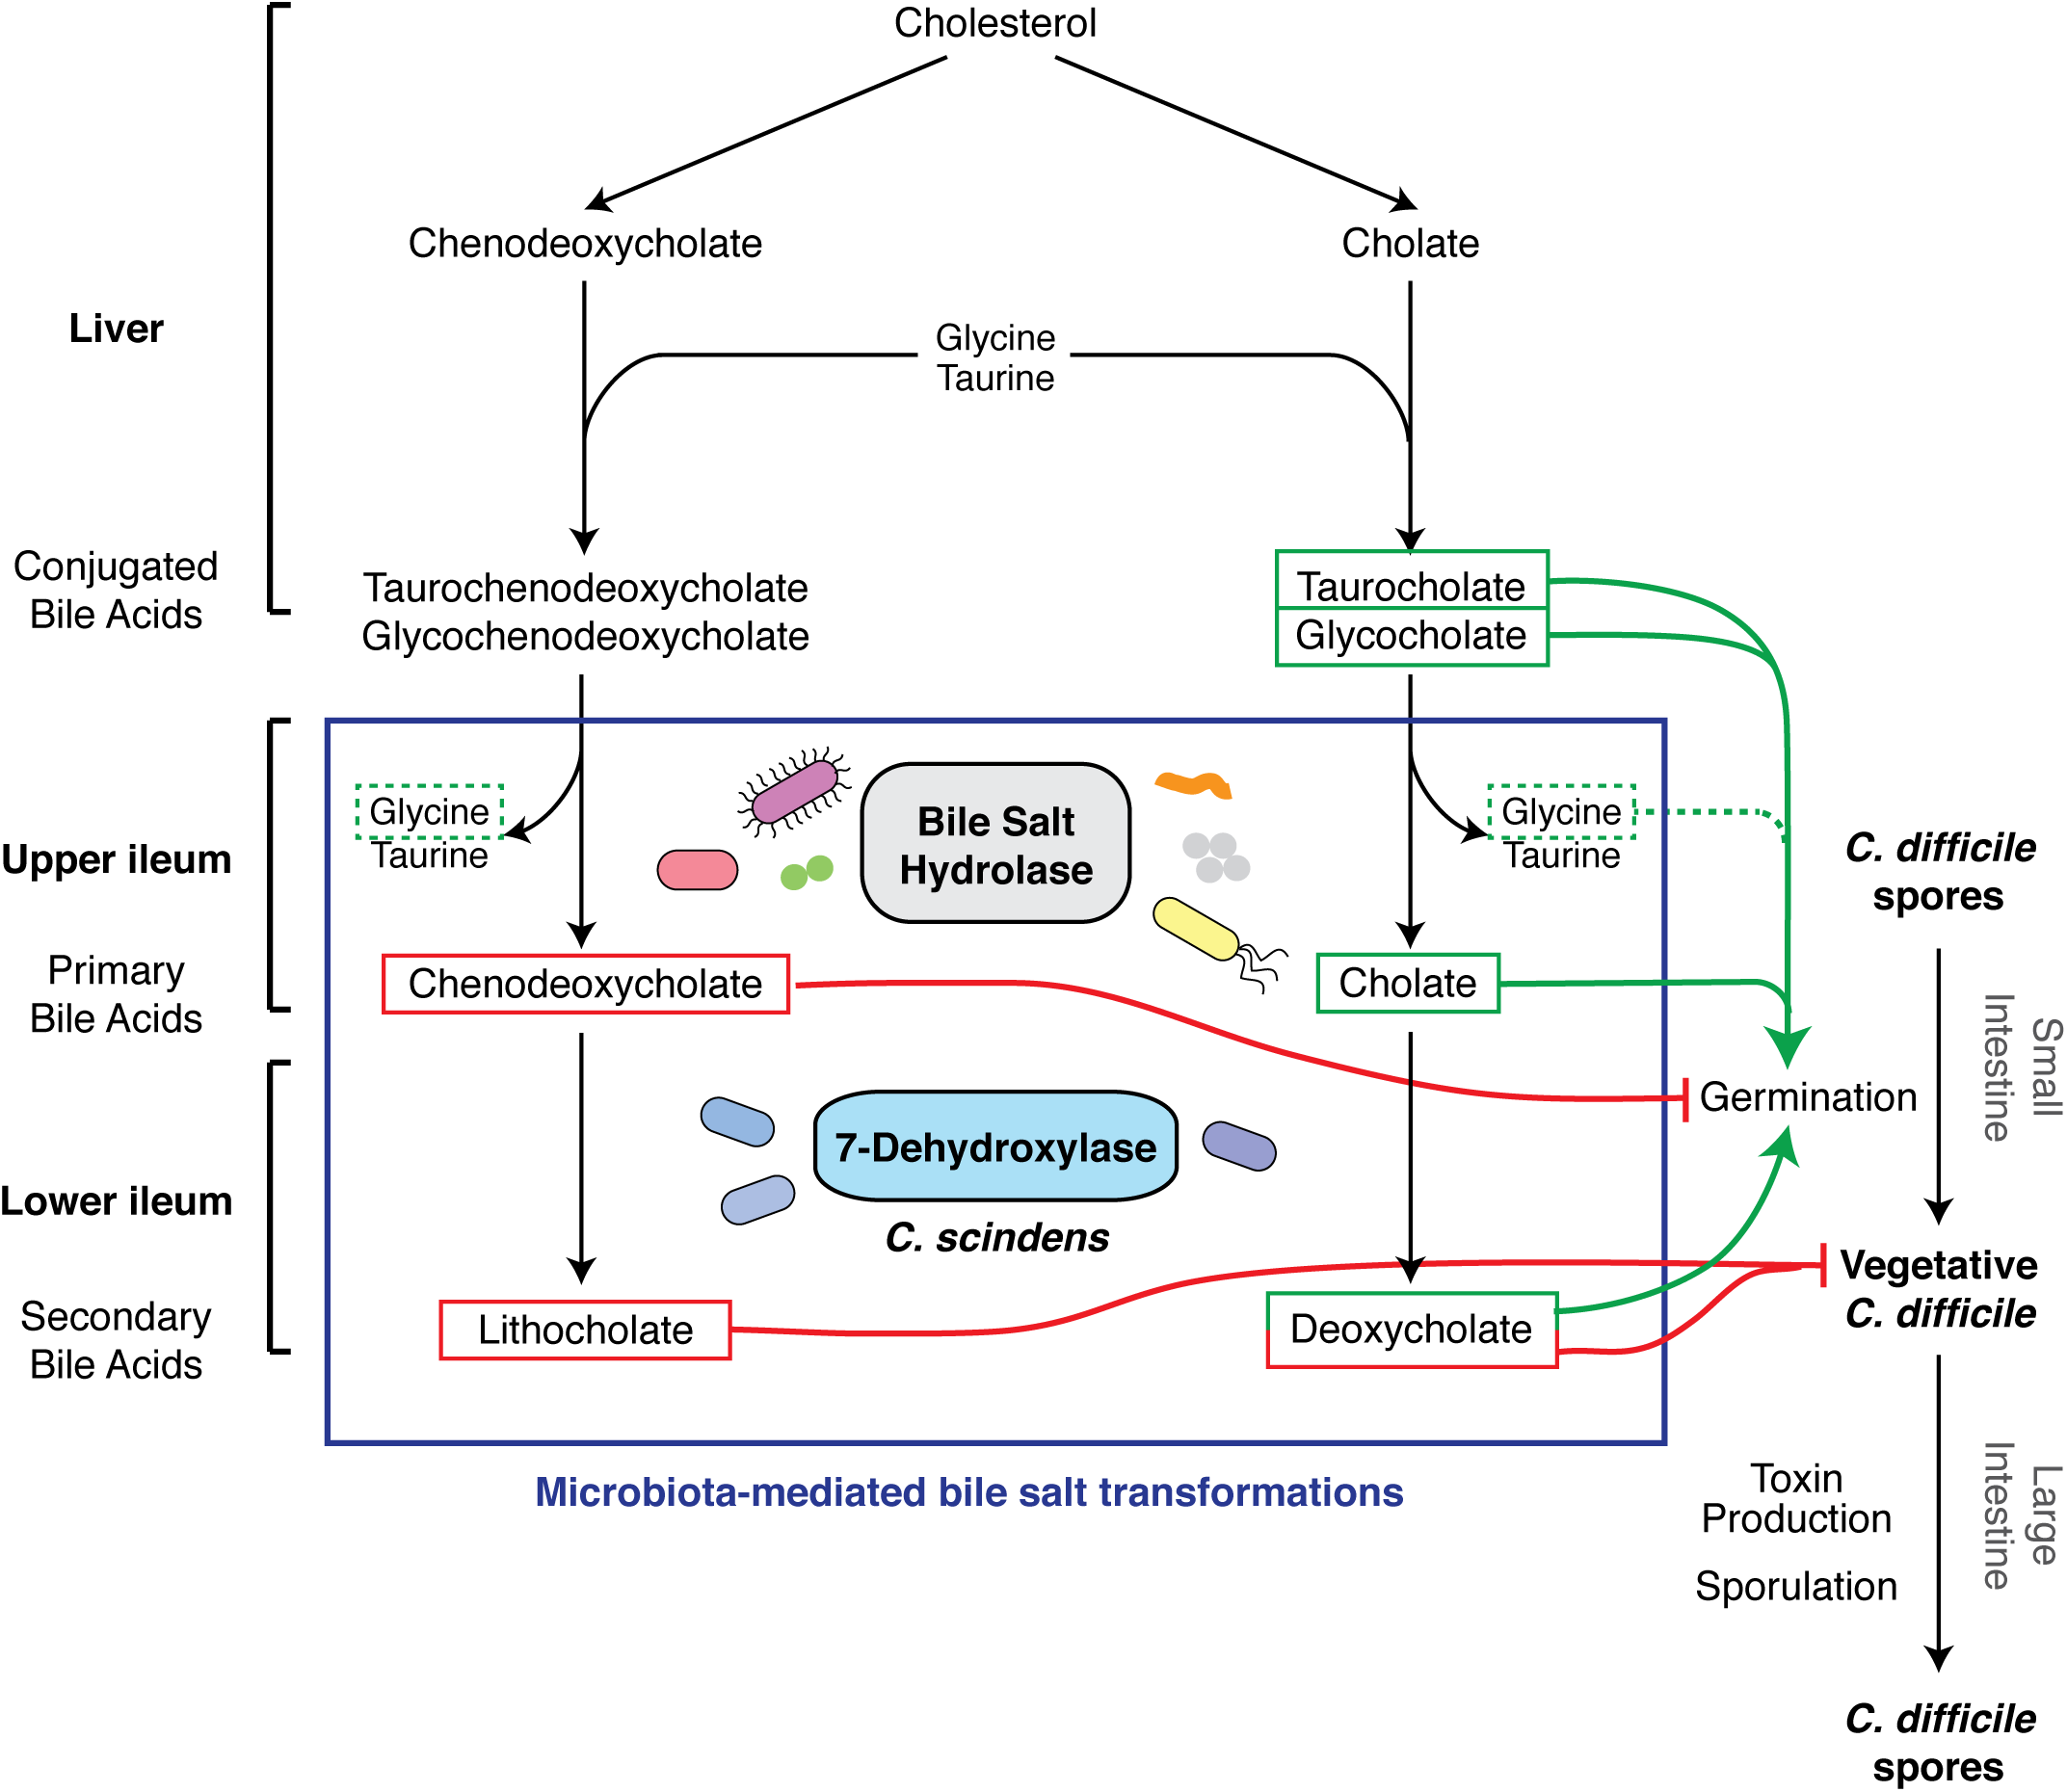 Effect of bile acid metabolism on the developmental life cycle of <i>C</i>. <i>difficile</i>.